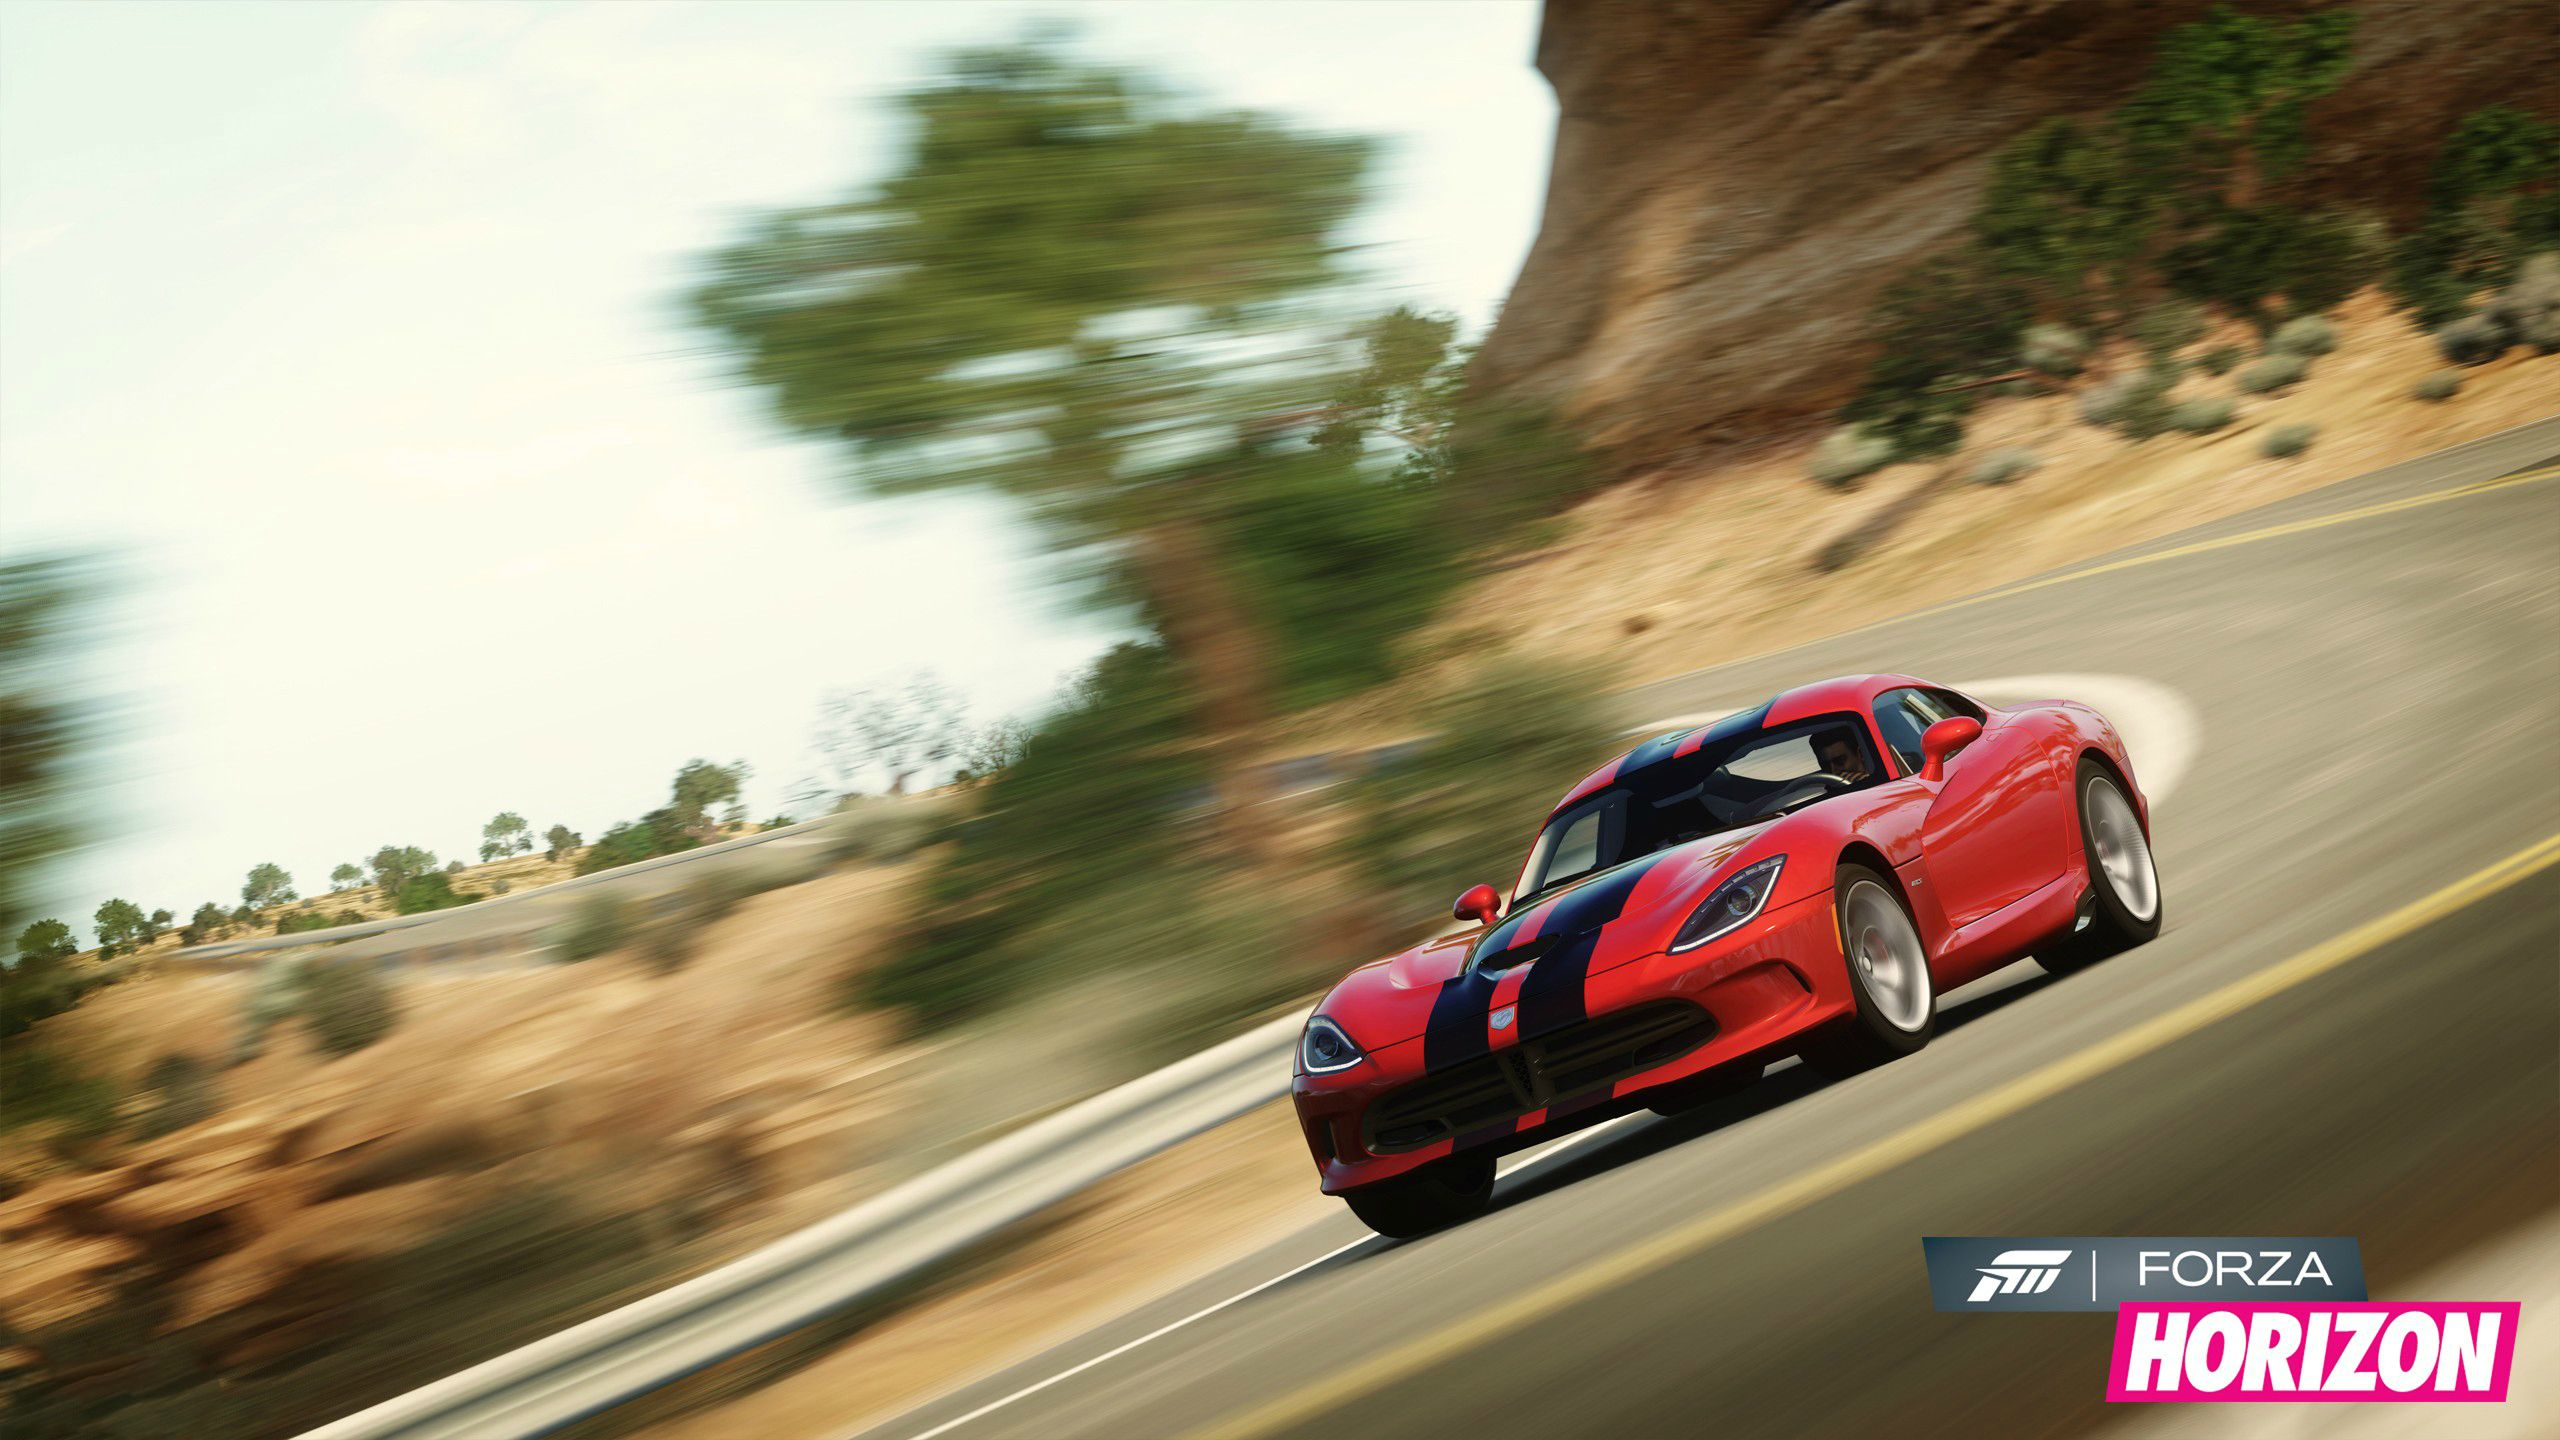 Forza Horizon wallpaper 2